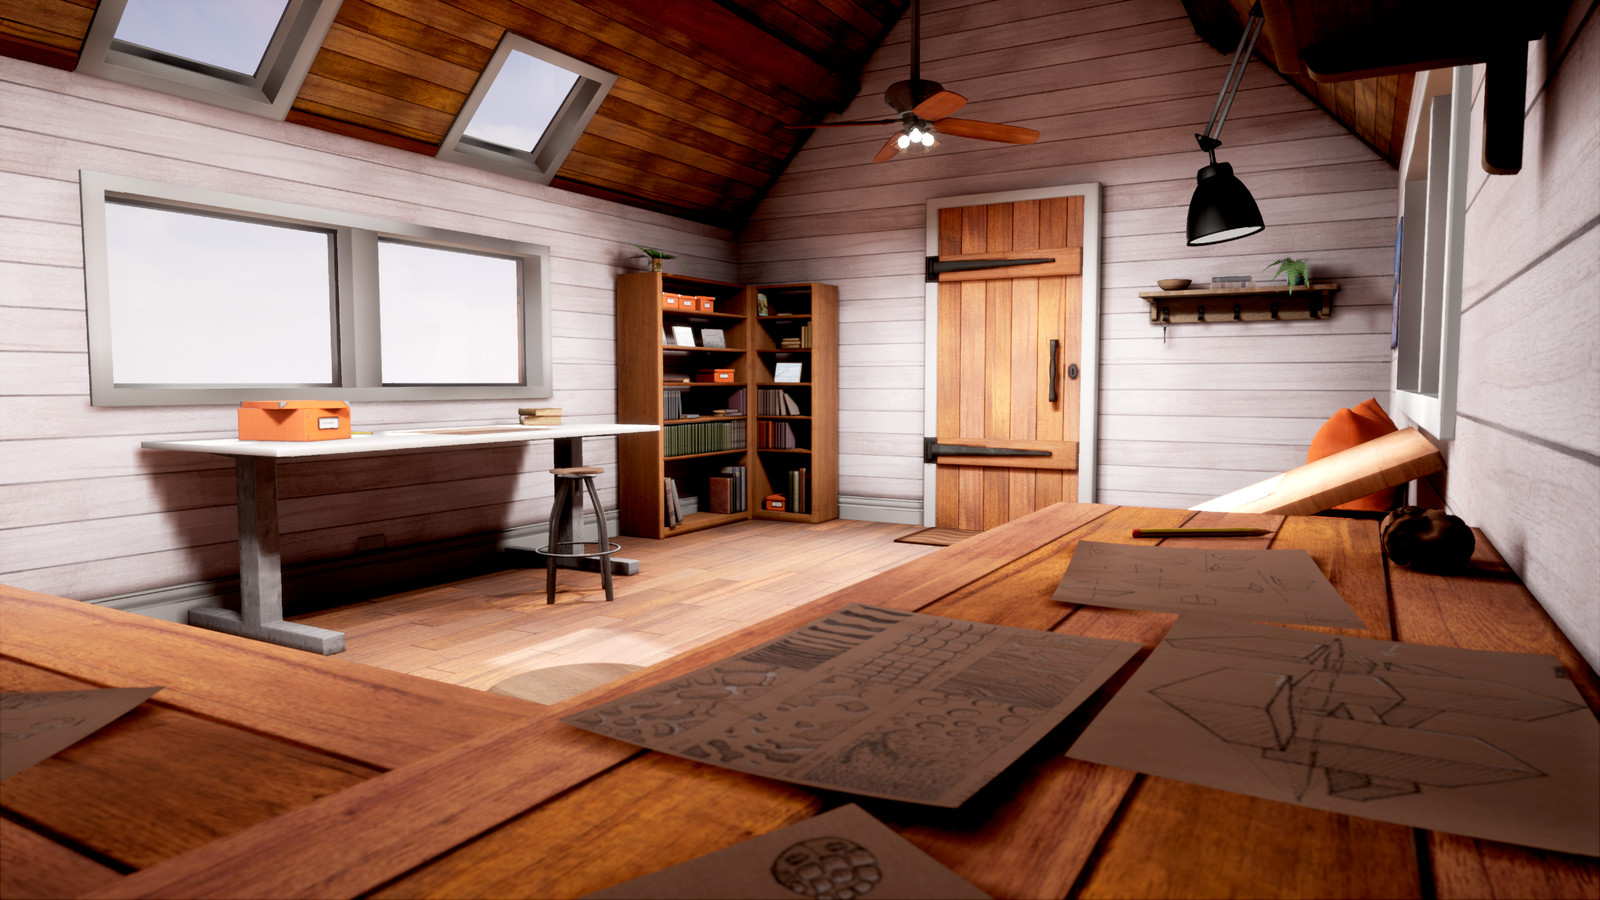 Dream Studio - Architectural Visualisation